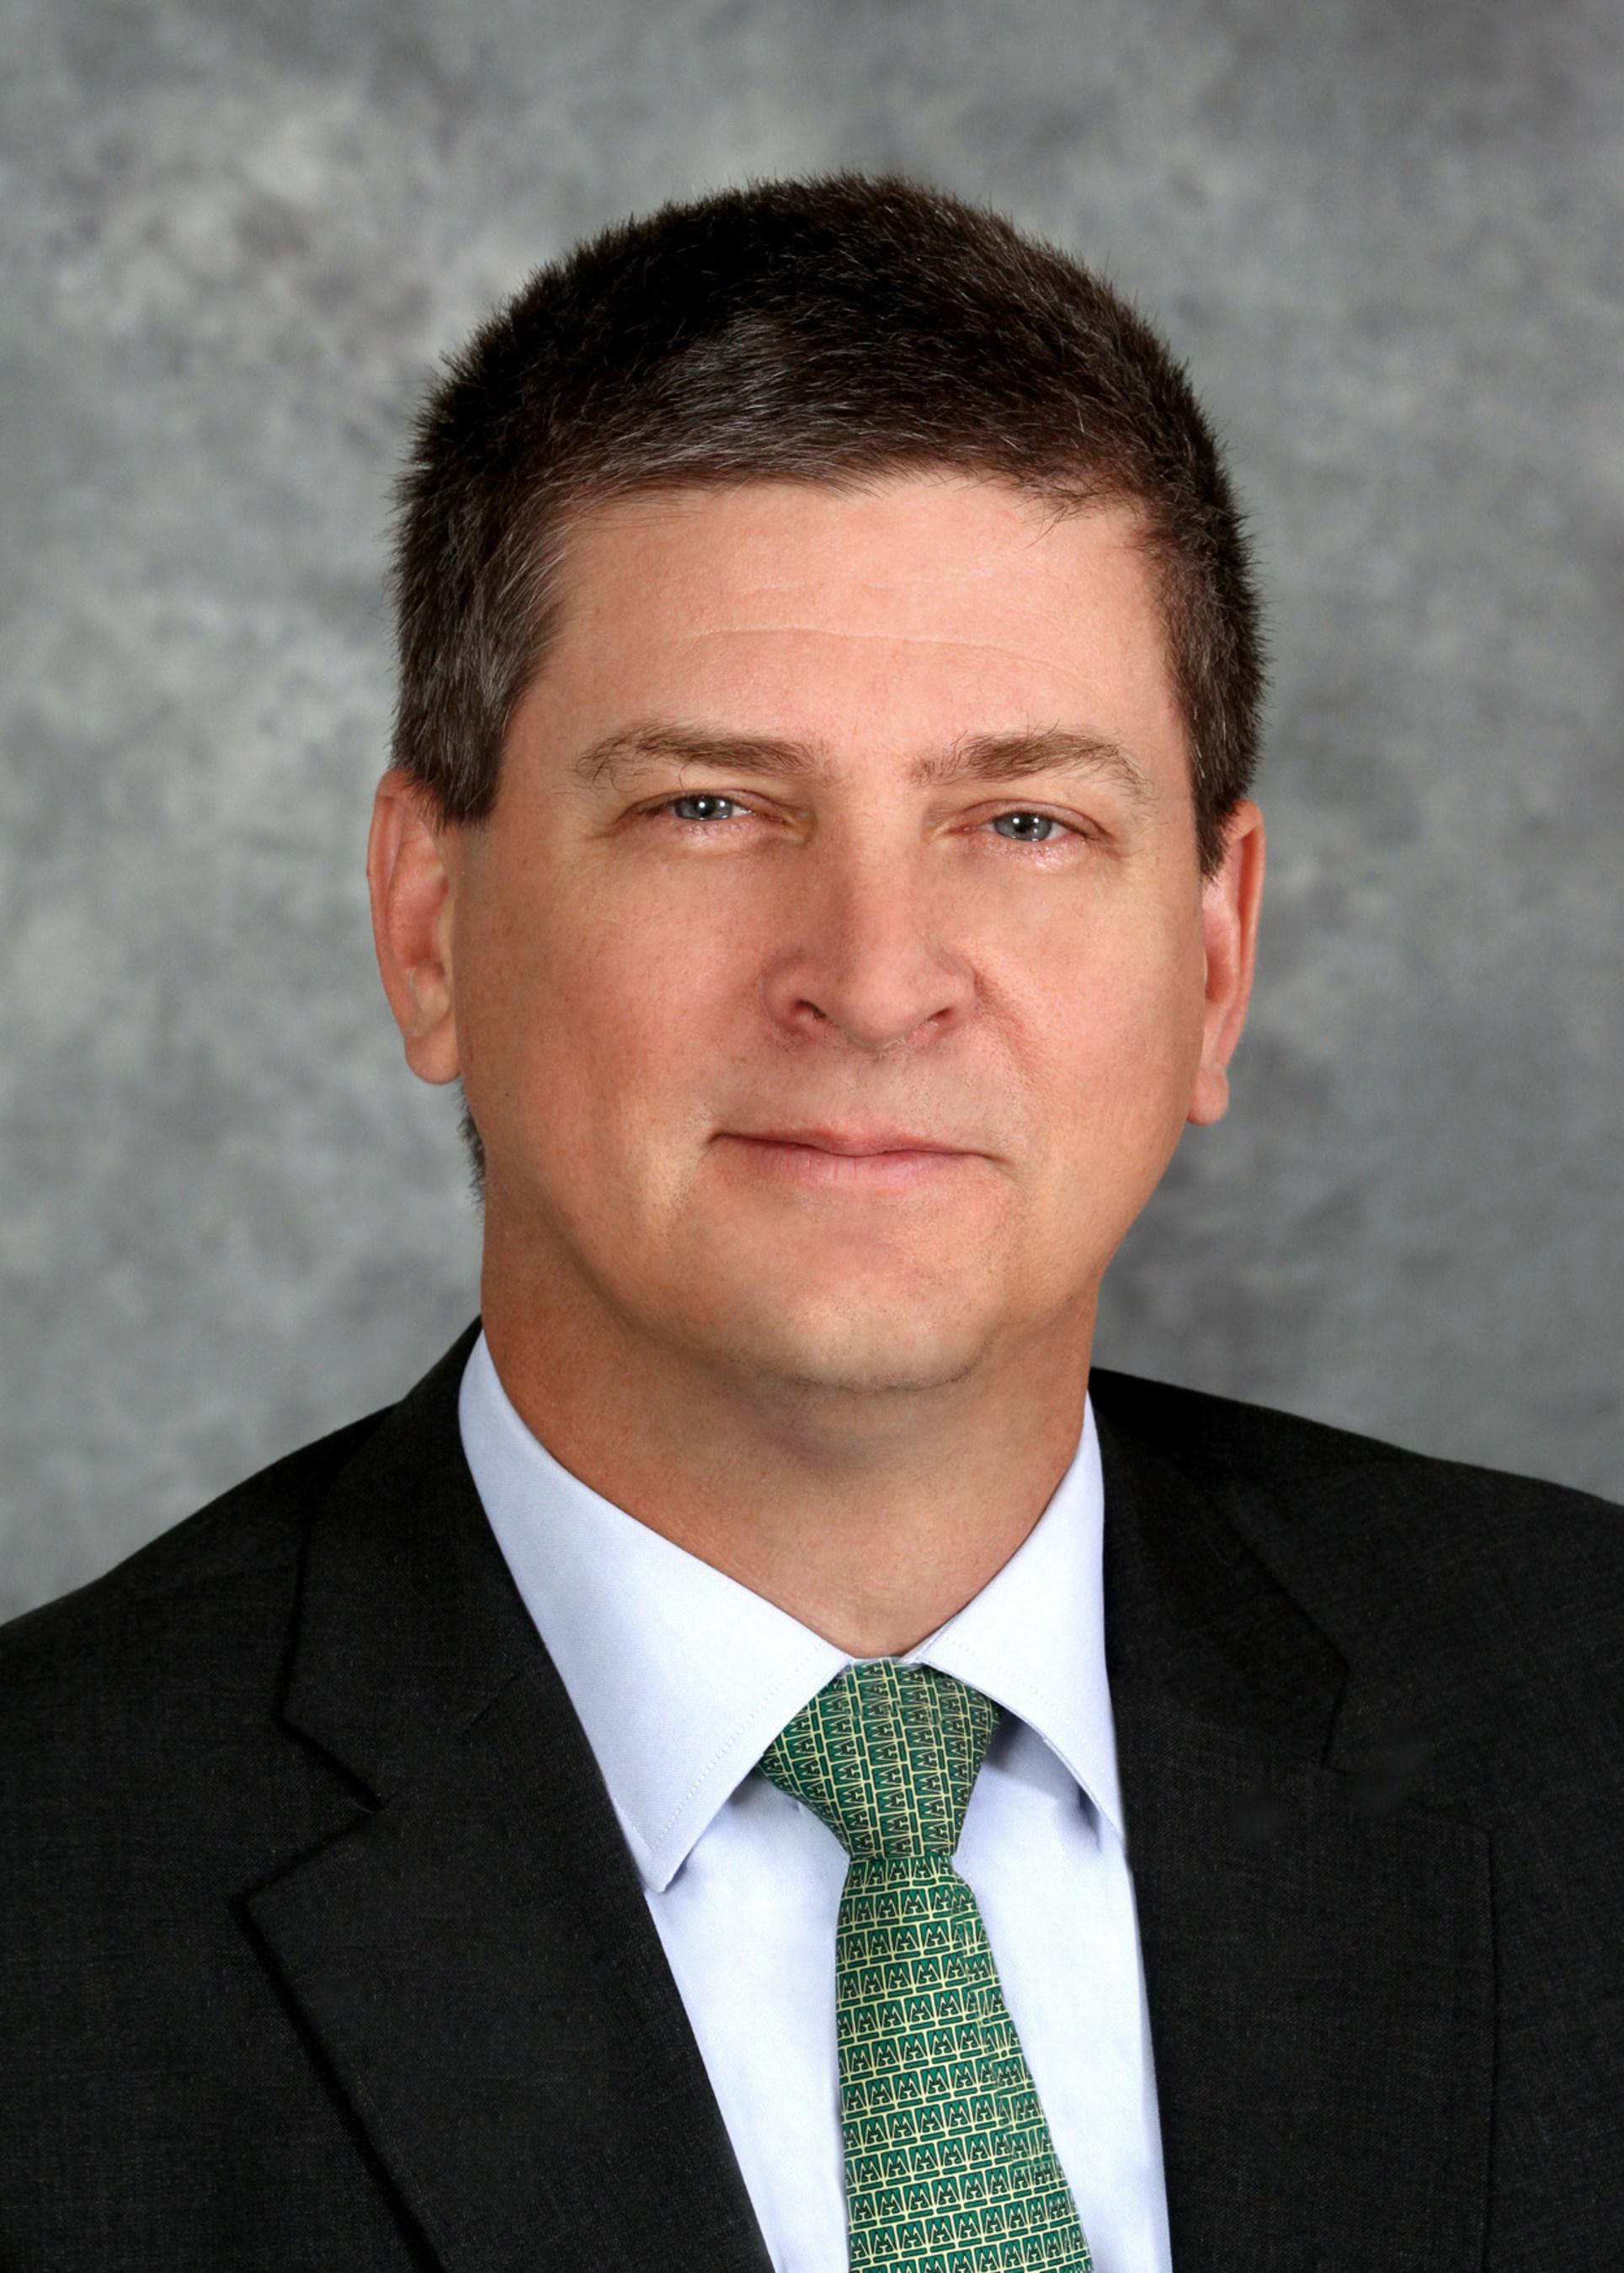 Darren J. King, Executive Vice President, M&T Bank